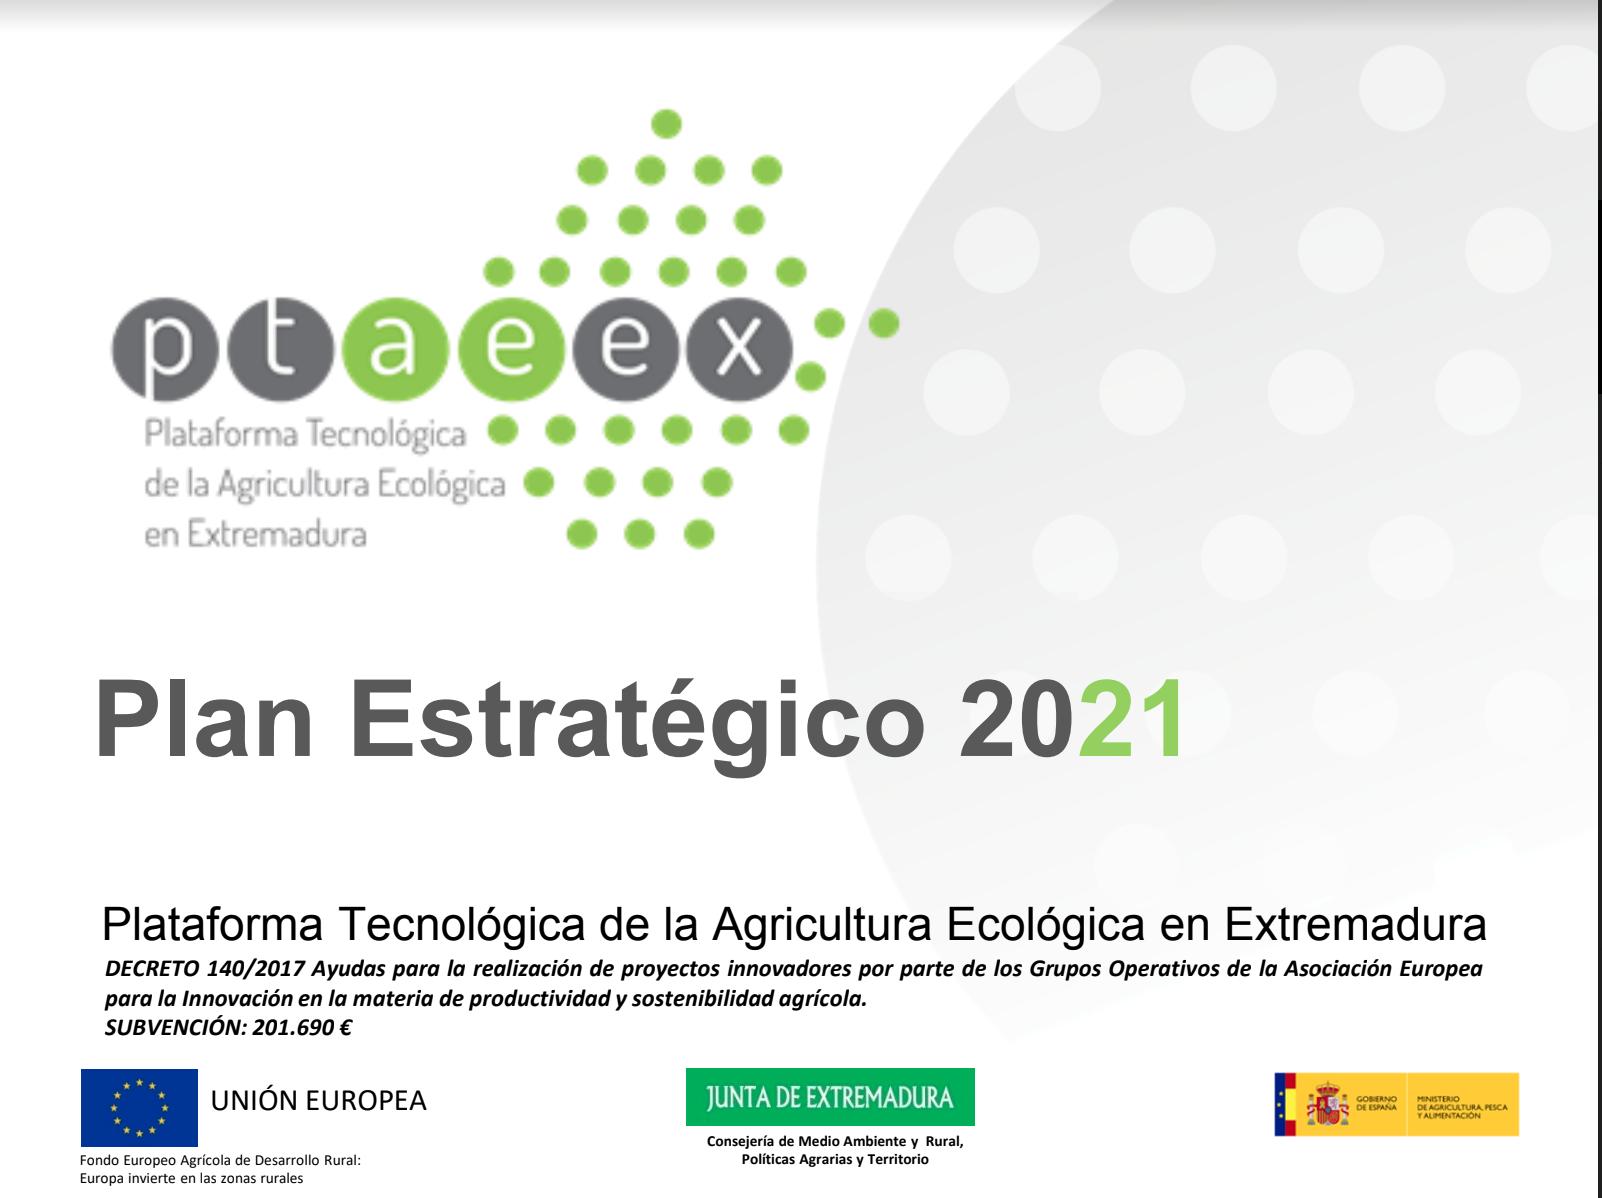 Plan Estratégico Ptaeex 2021